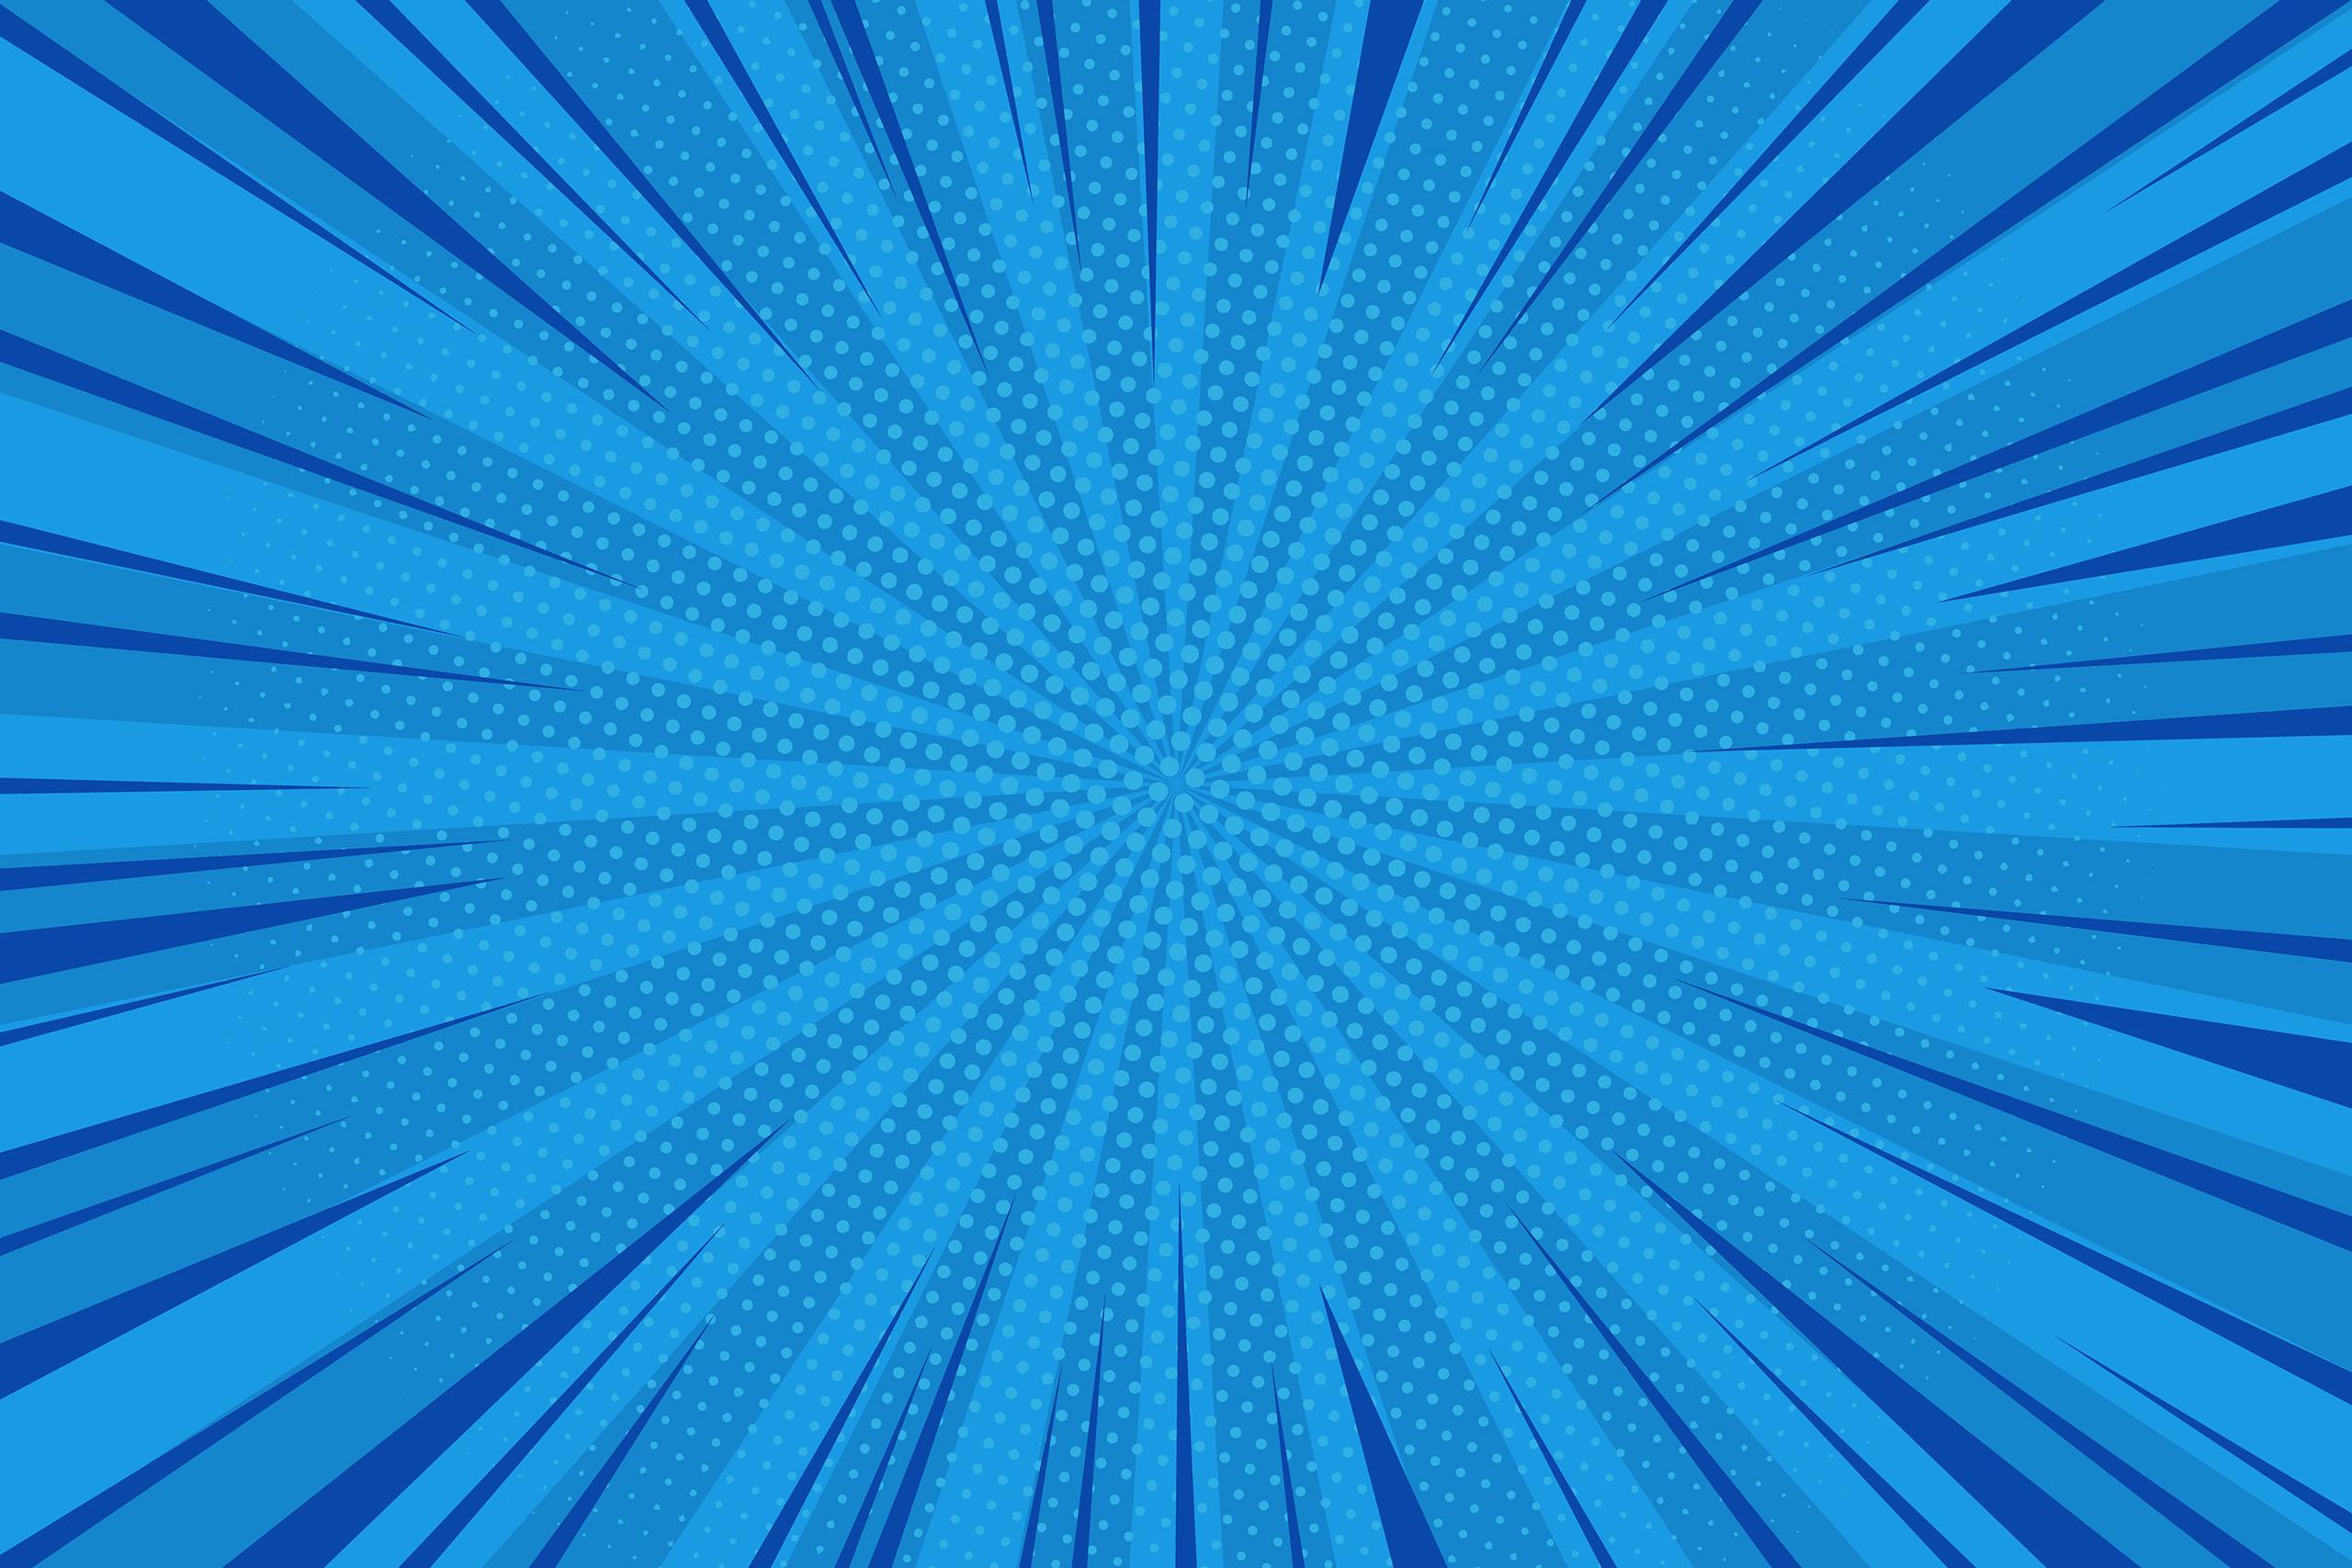 Картинка синий фон для фотошопа с симметричными бирюзовыми линиями из центра к краям в стиле аниме